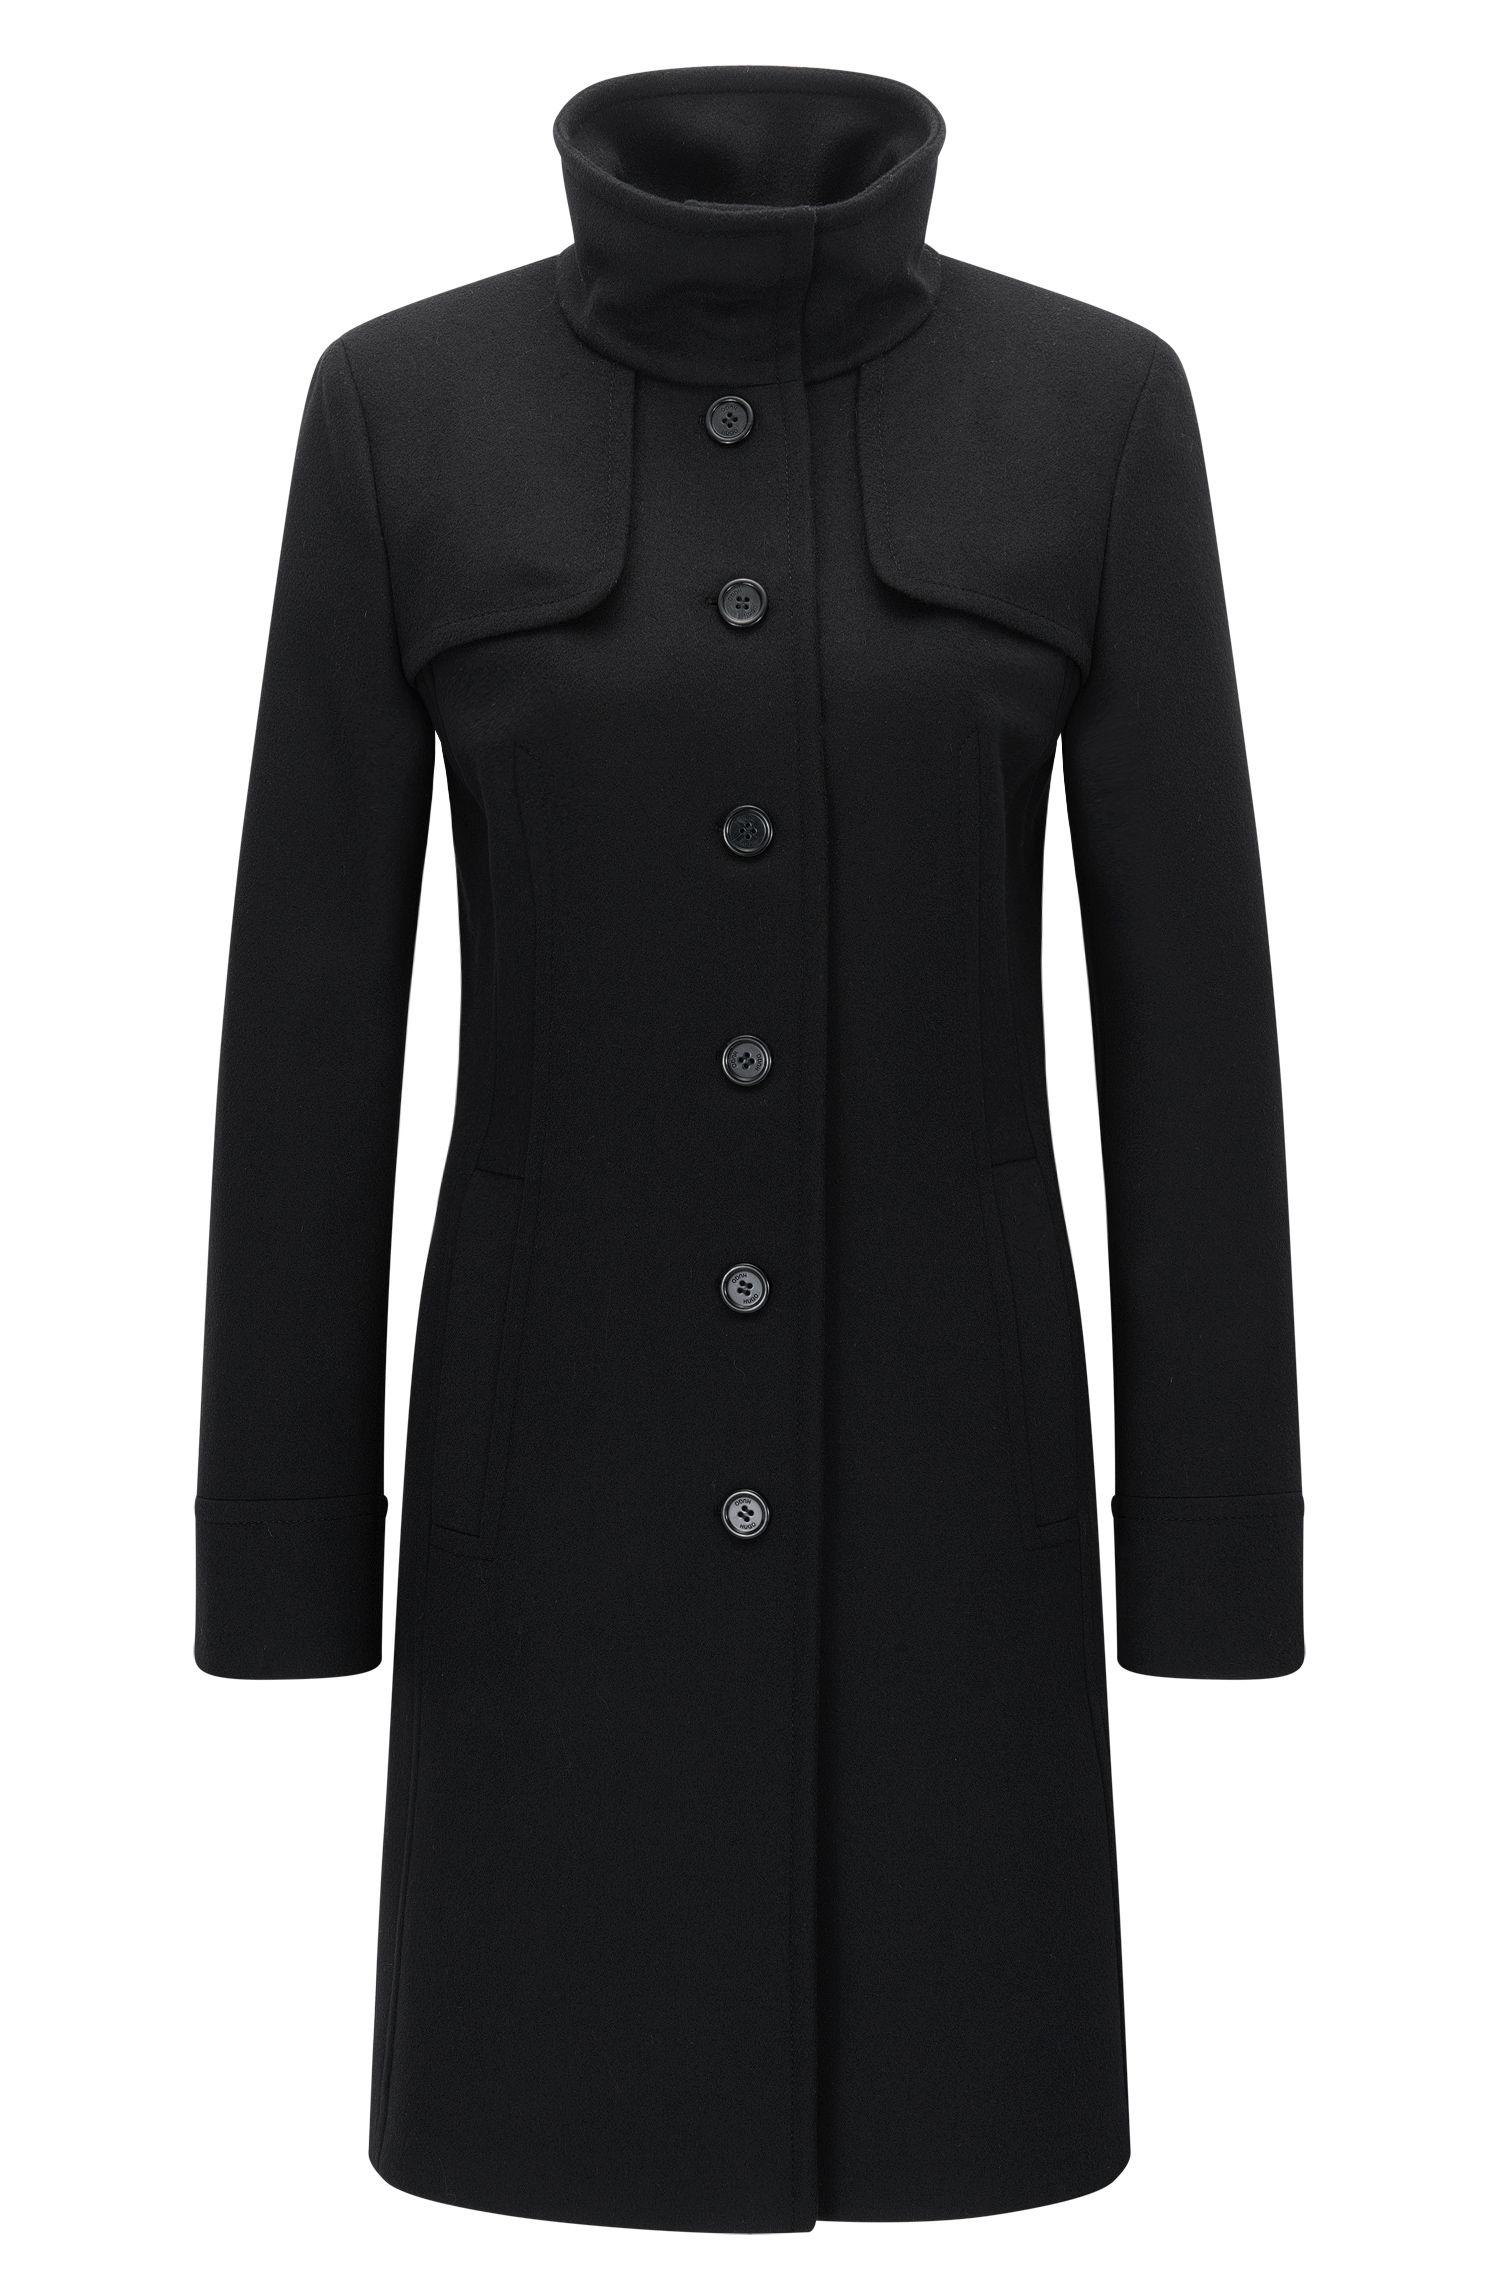 High Collar Virgin Wool Cashmere Coat | Mibelli, Black